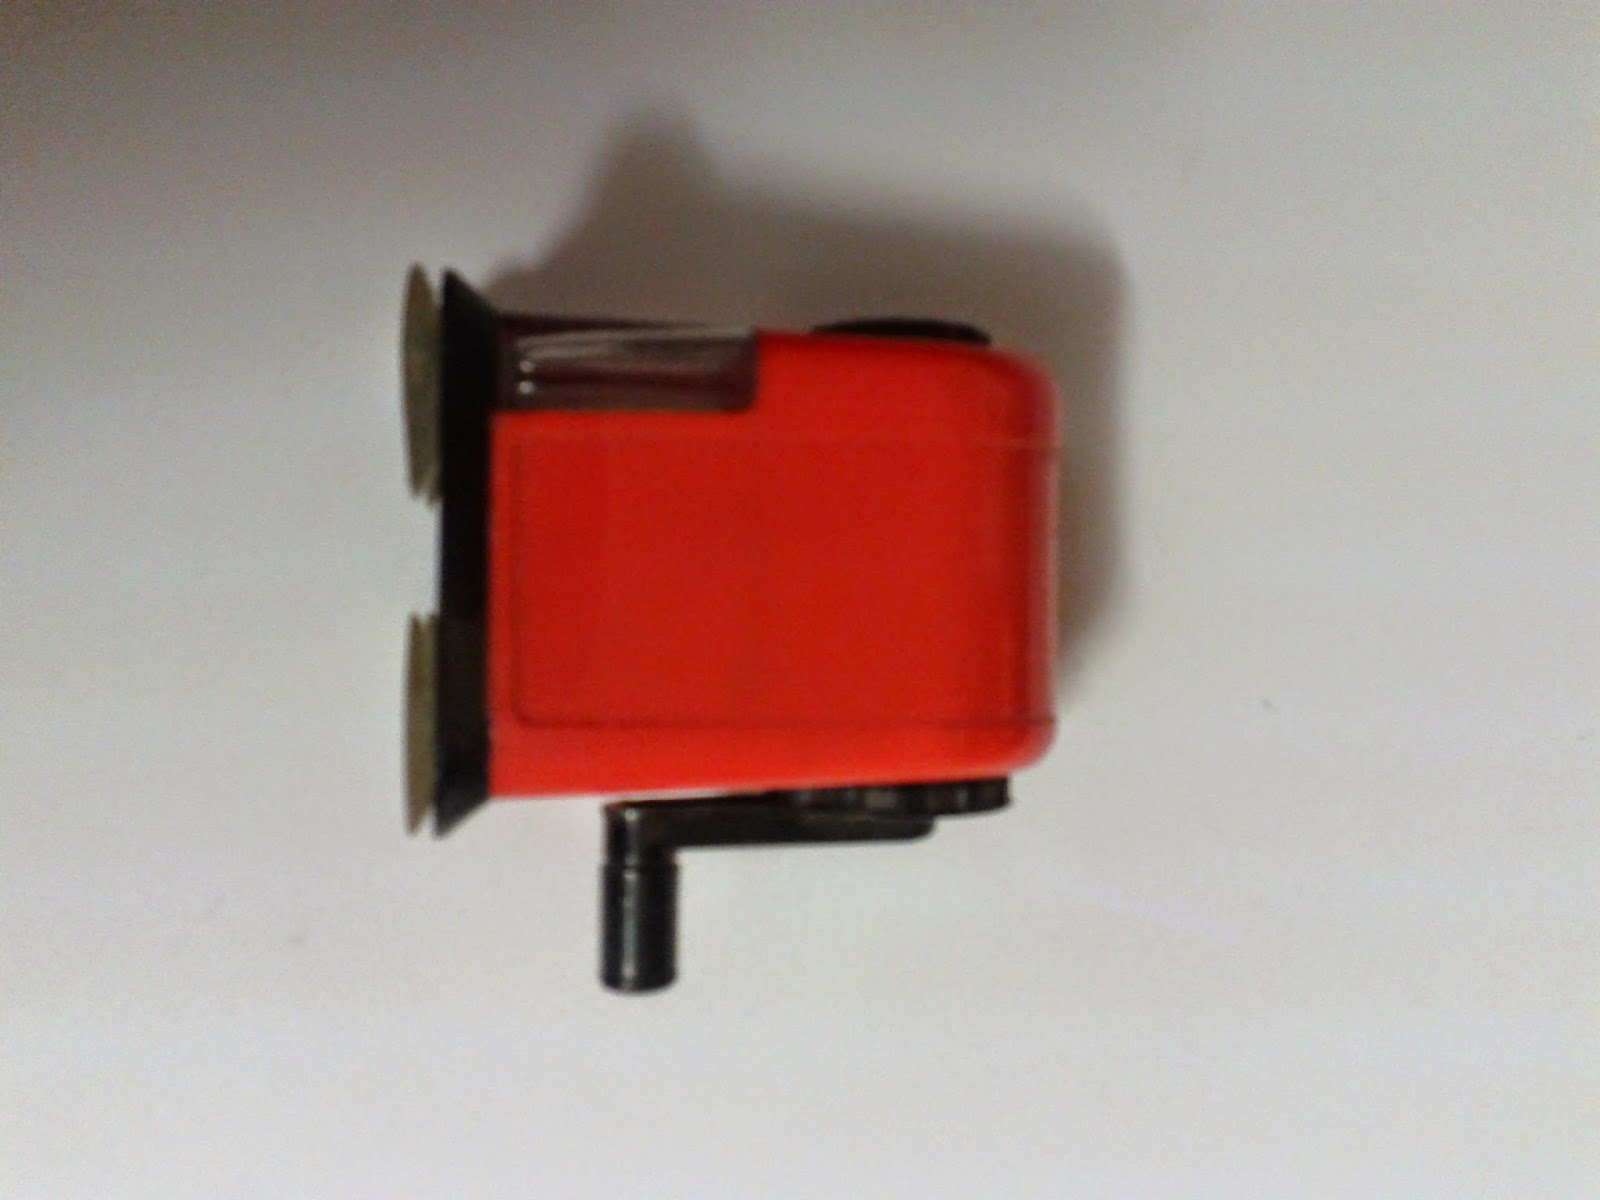 Stock photo: Orange and black old school pencil sharpener